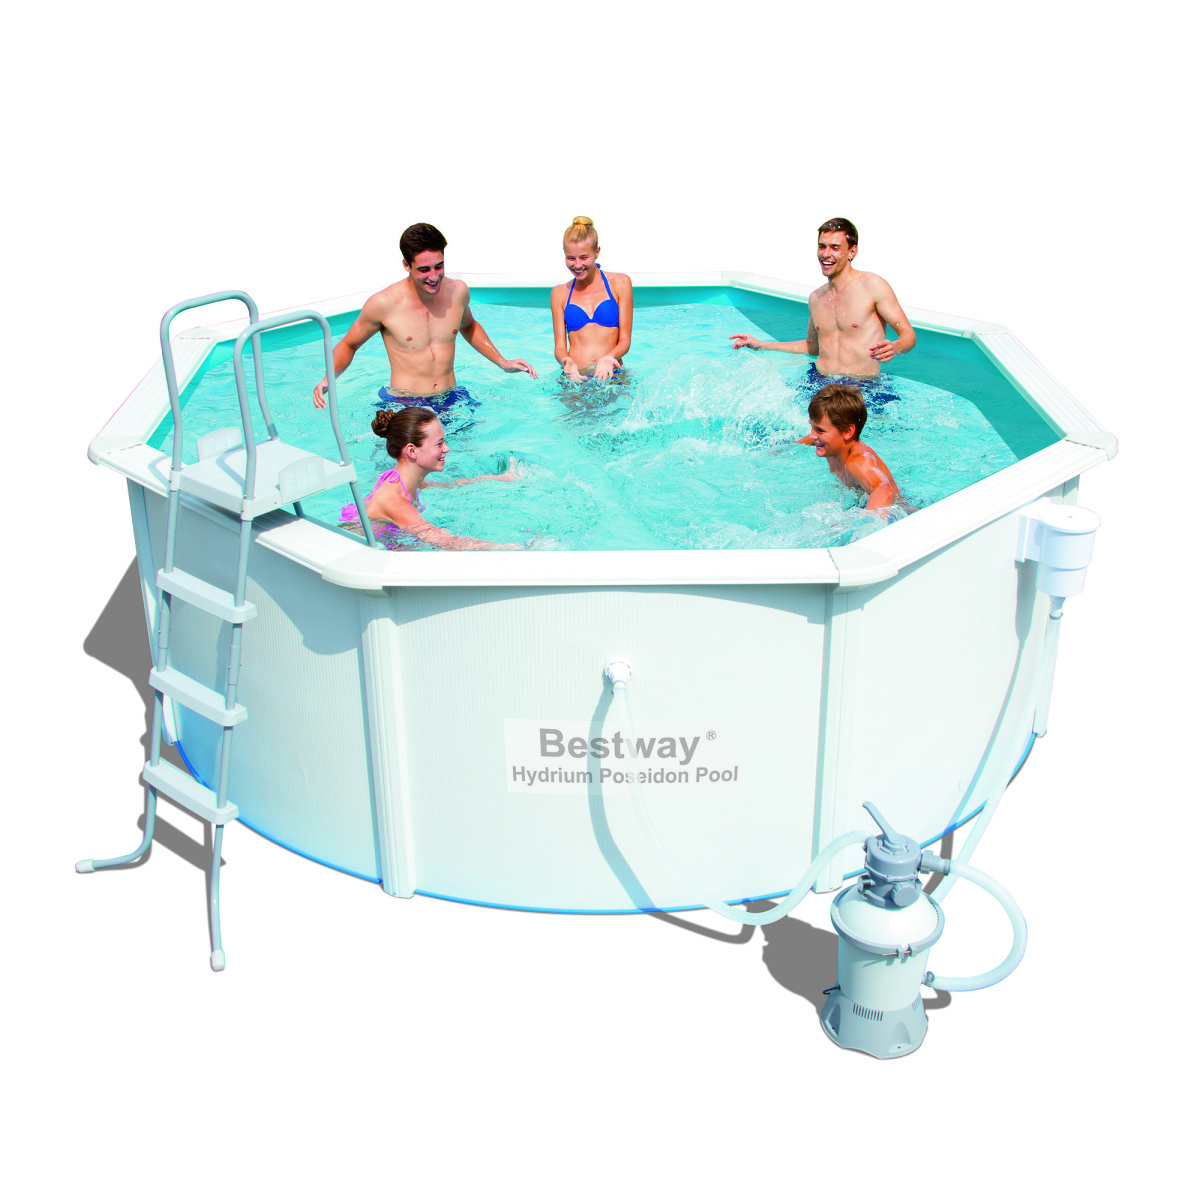 Сборный бассейн Bestway Hydrium Pool Poseidon 56574/56285 (366×122)